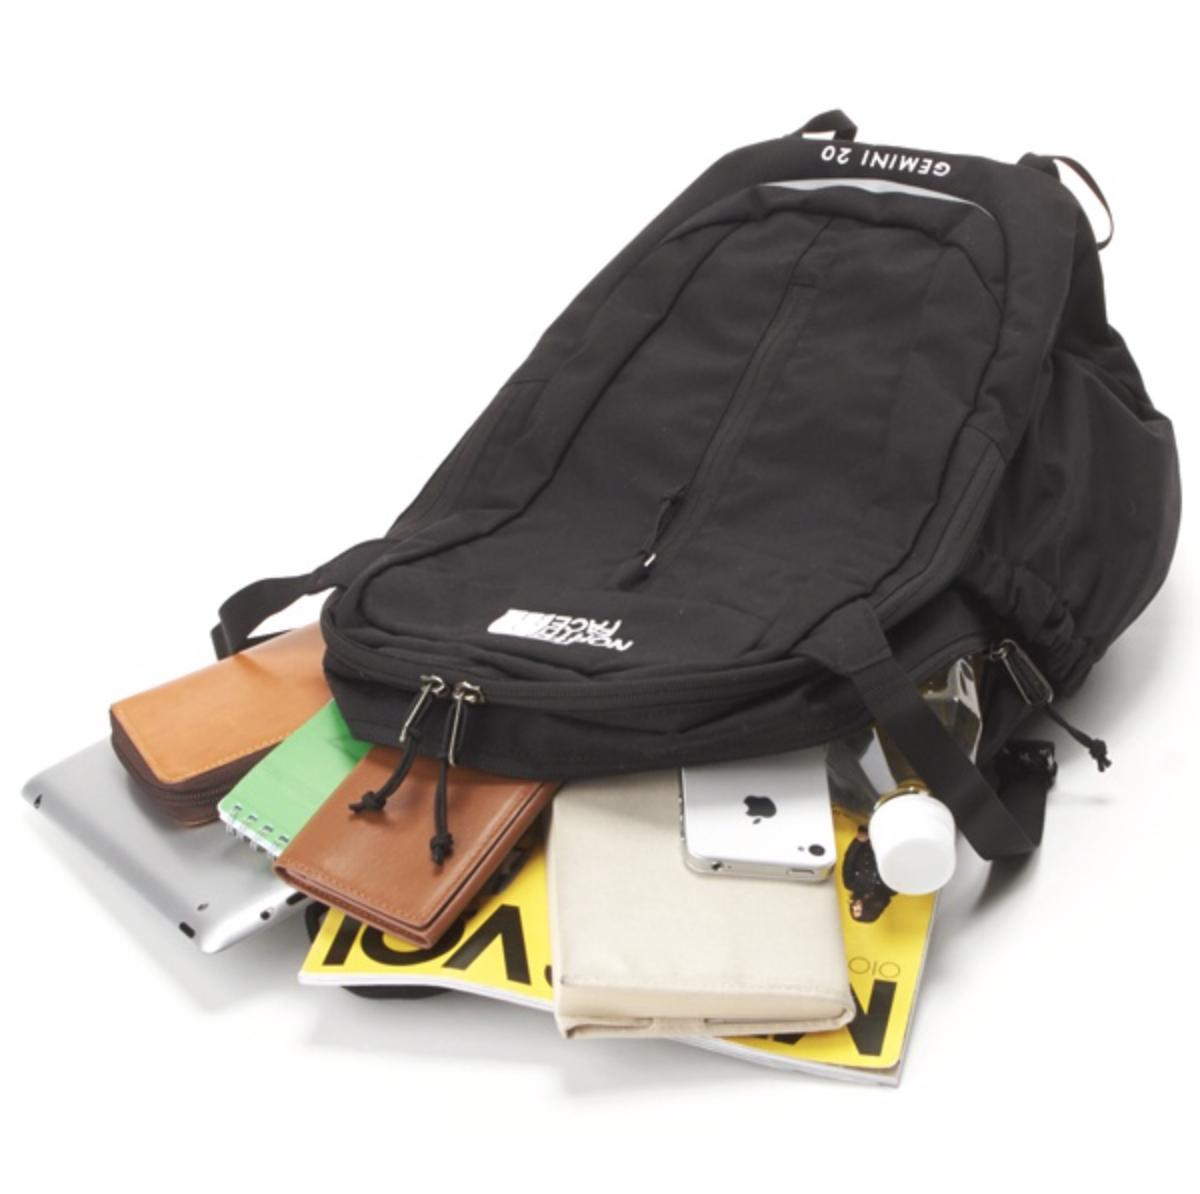 f:id:thebackpack:20190406090509p:plain